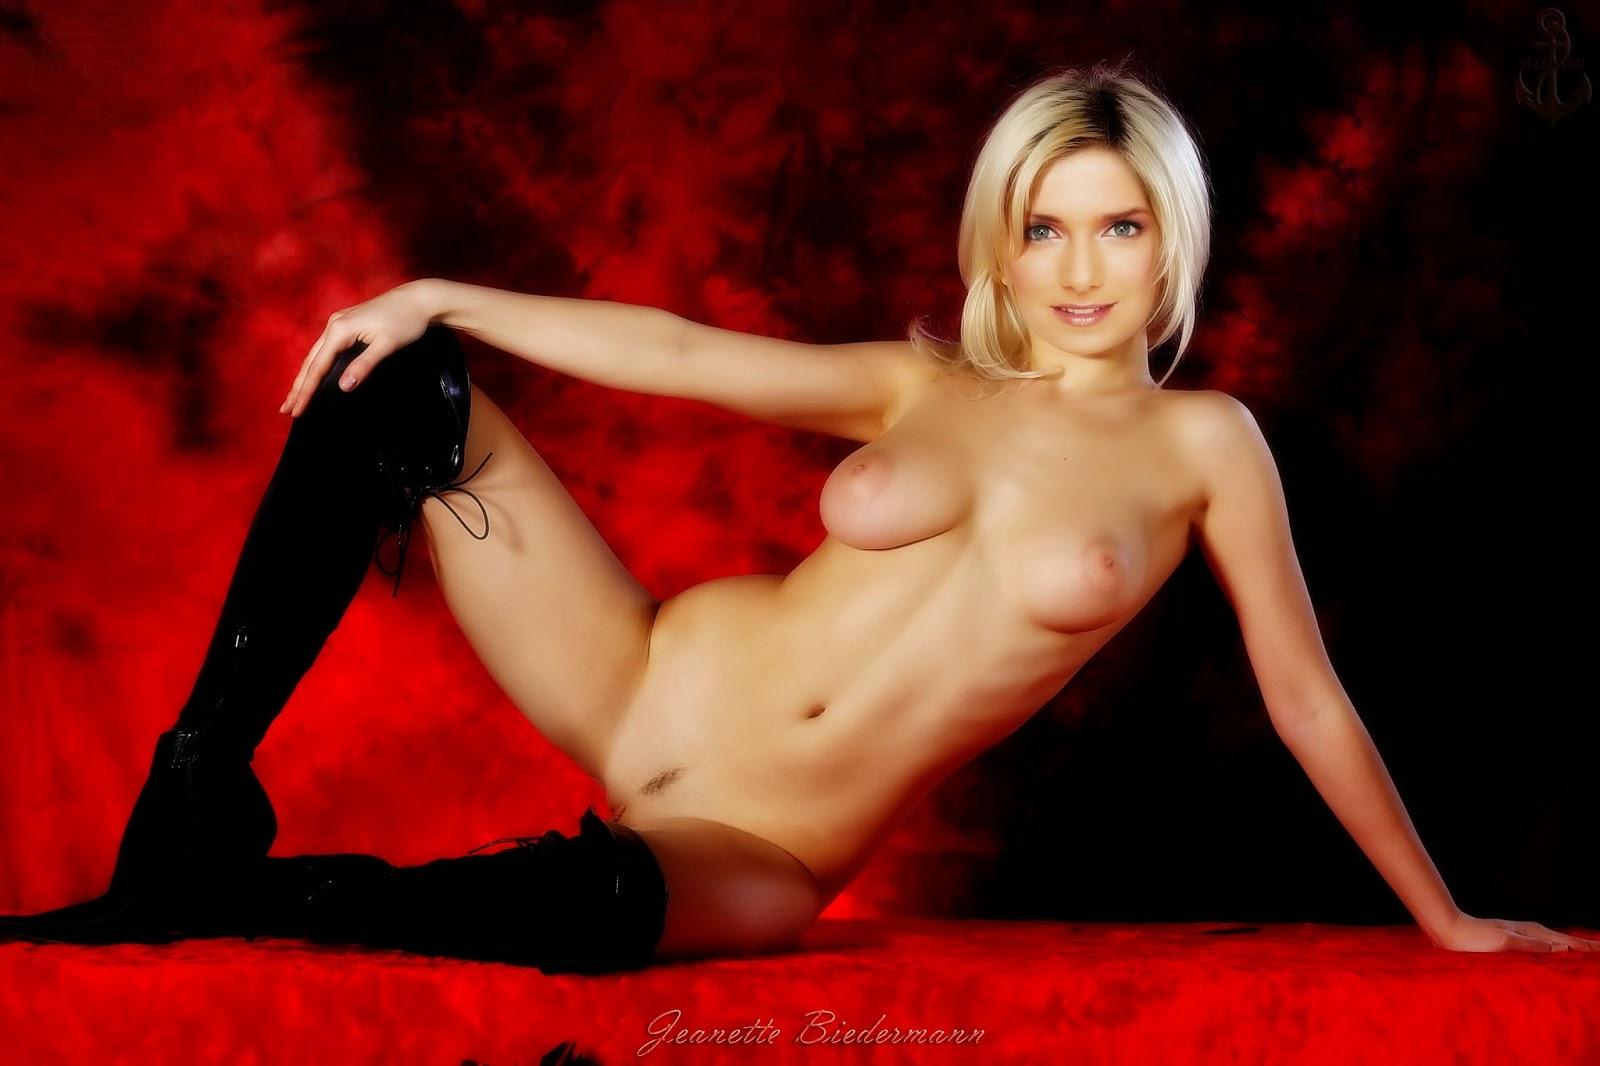 Hd sexyfree boobwallpaper pics erotic video